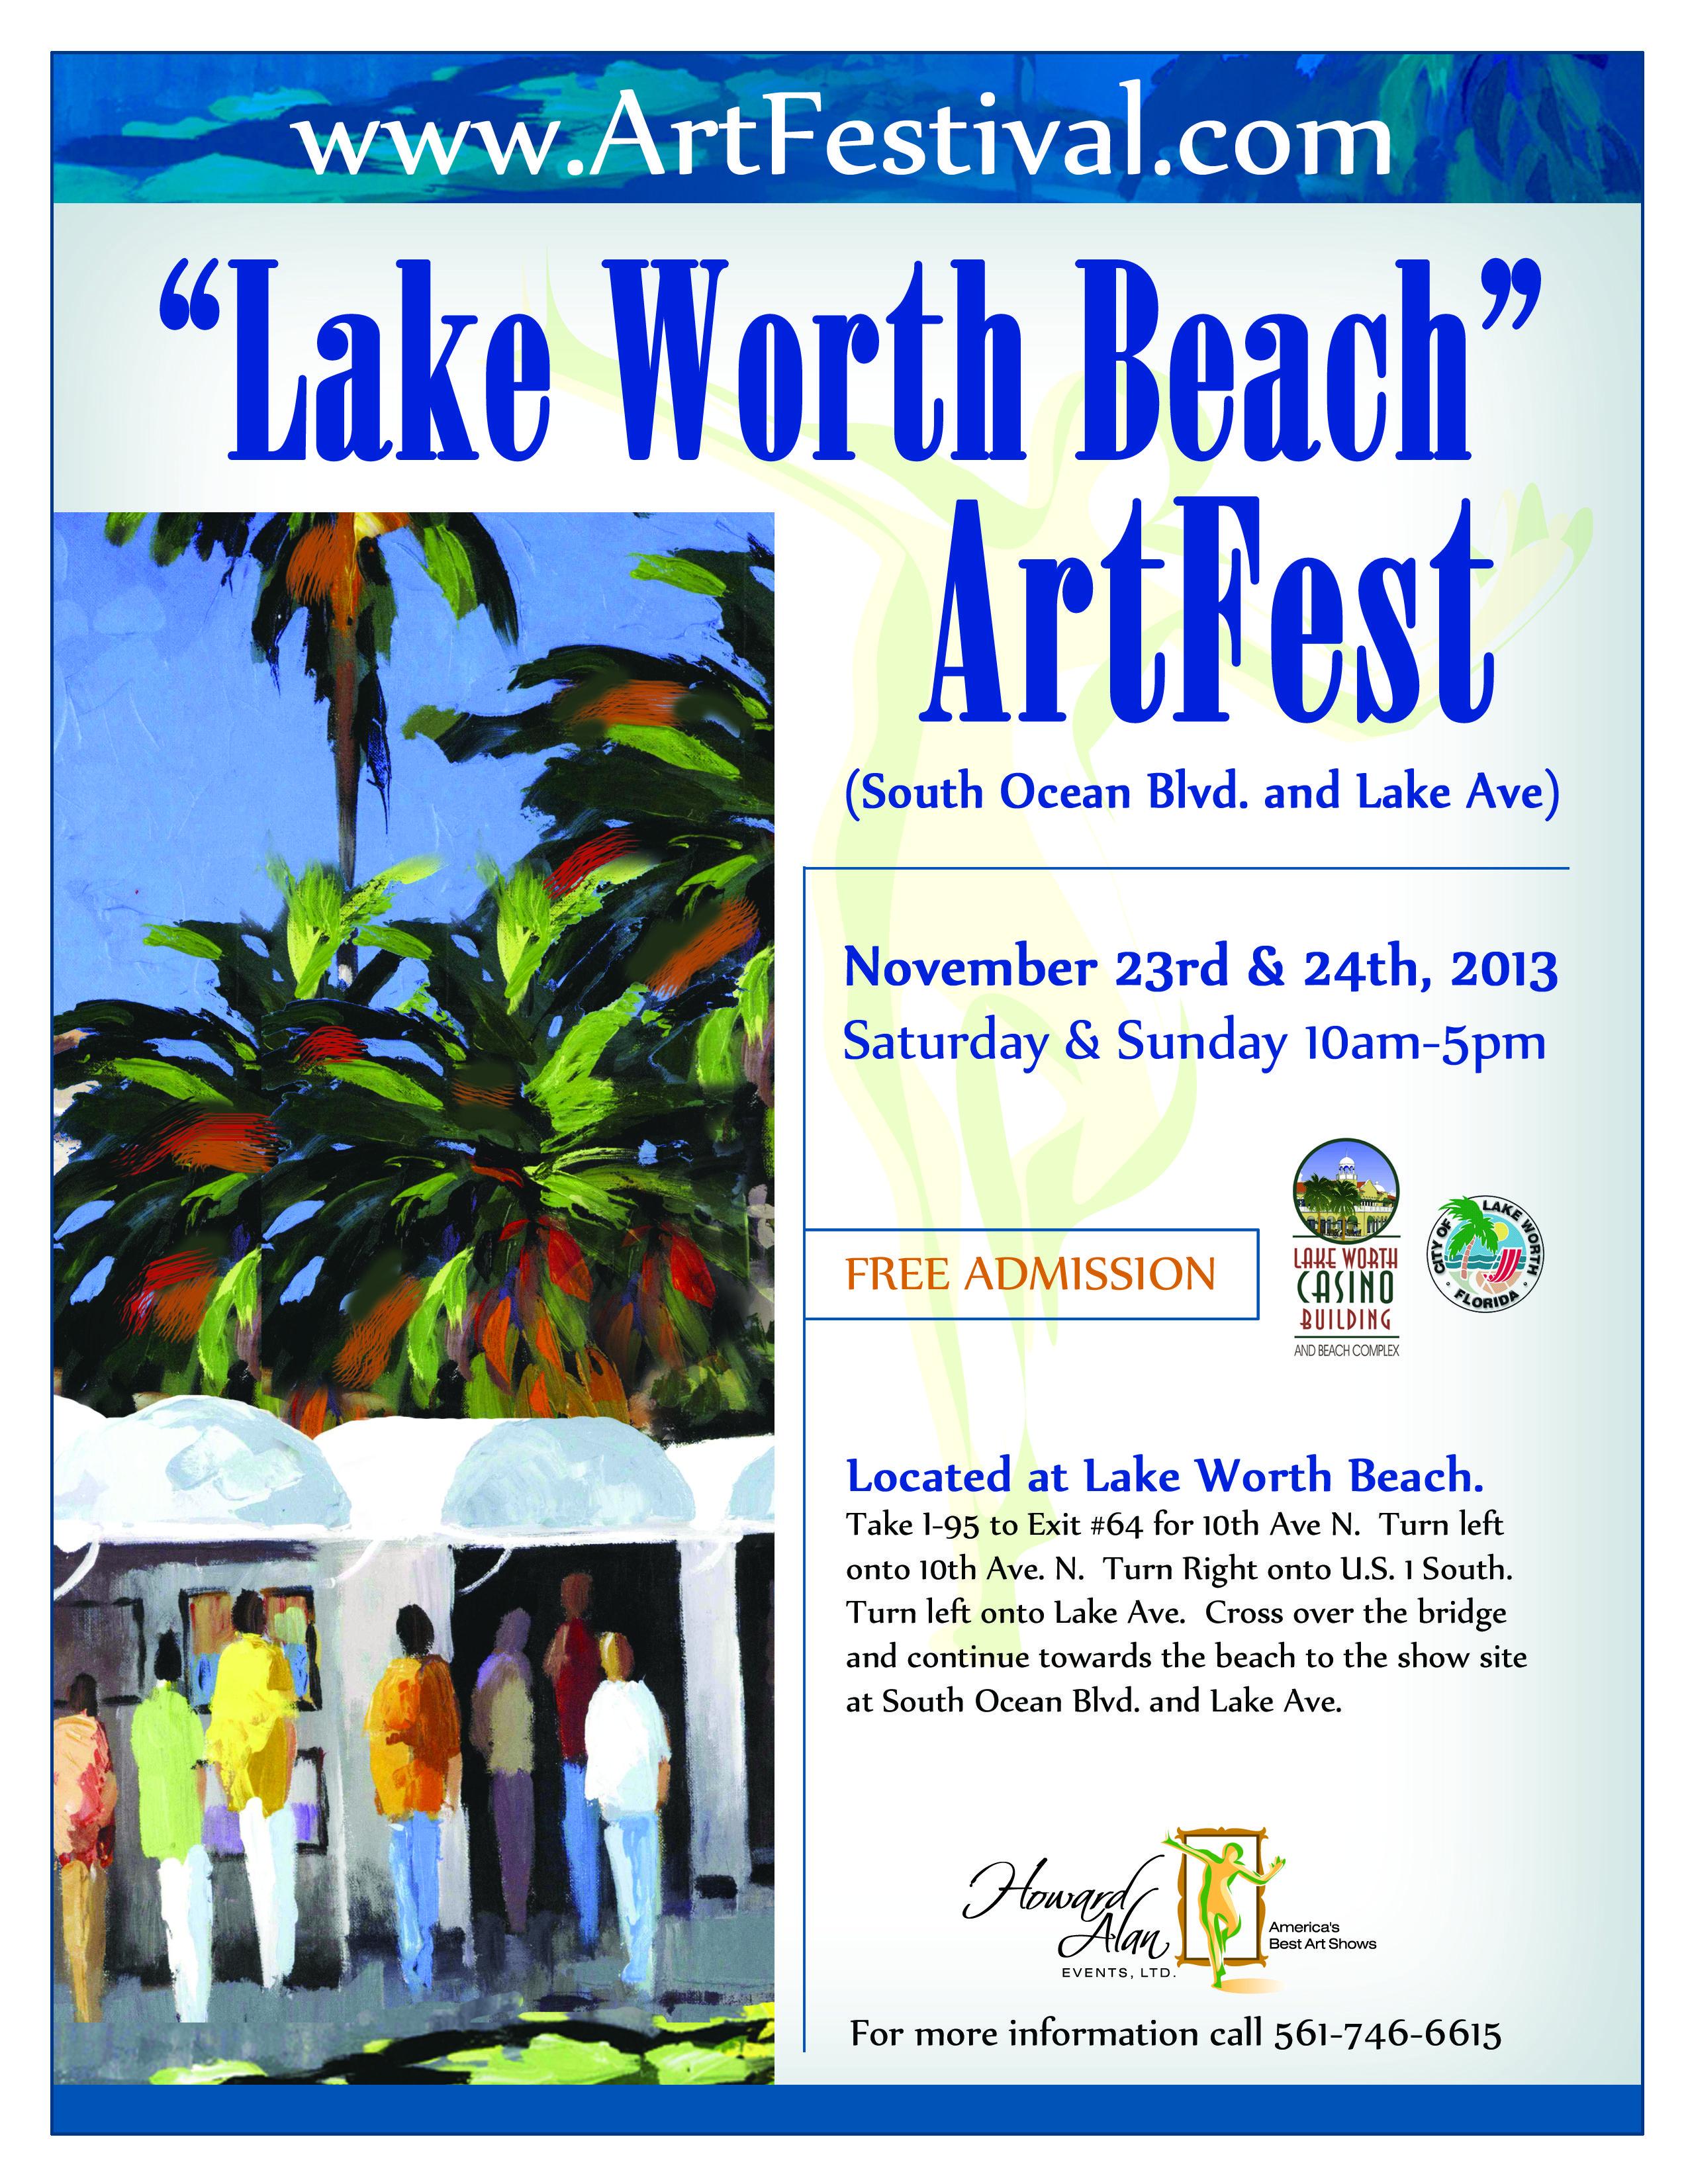 #LakeWorthCasino #DowntownLakeWorth #CraftFair #AmericanCraftEndeavors #LakeWorthBeachArtFest